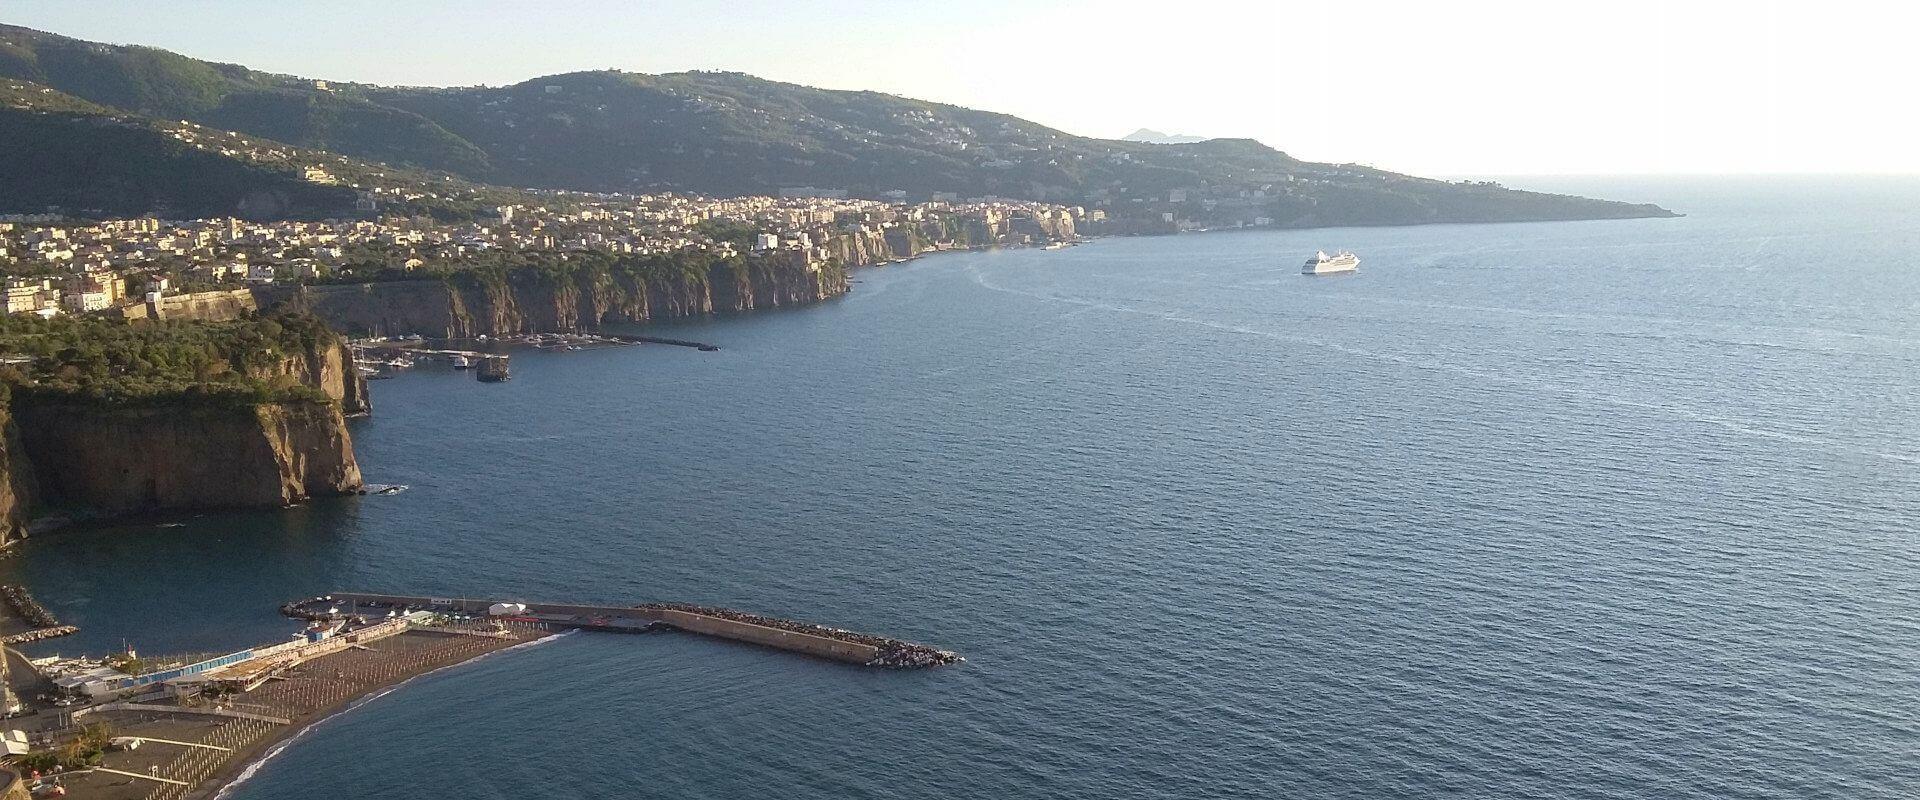 View of Sorrento Coast in Italy